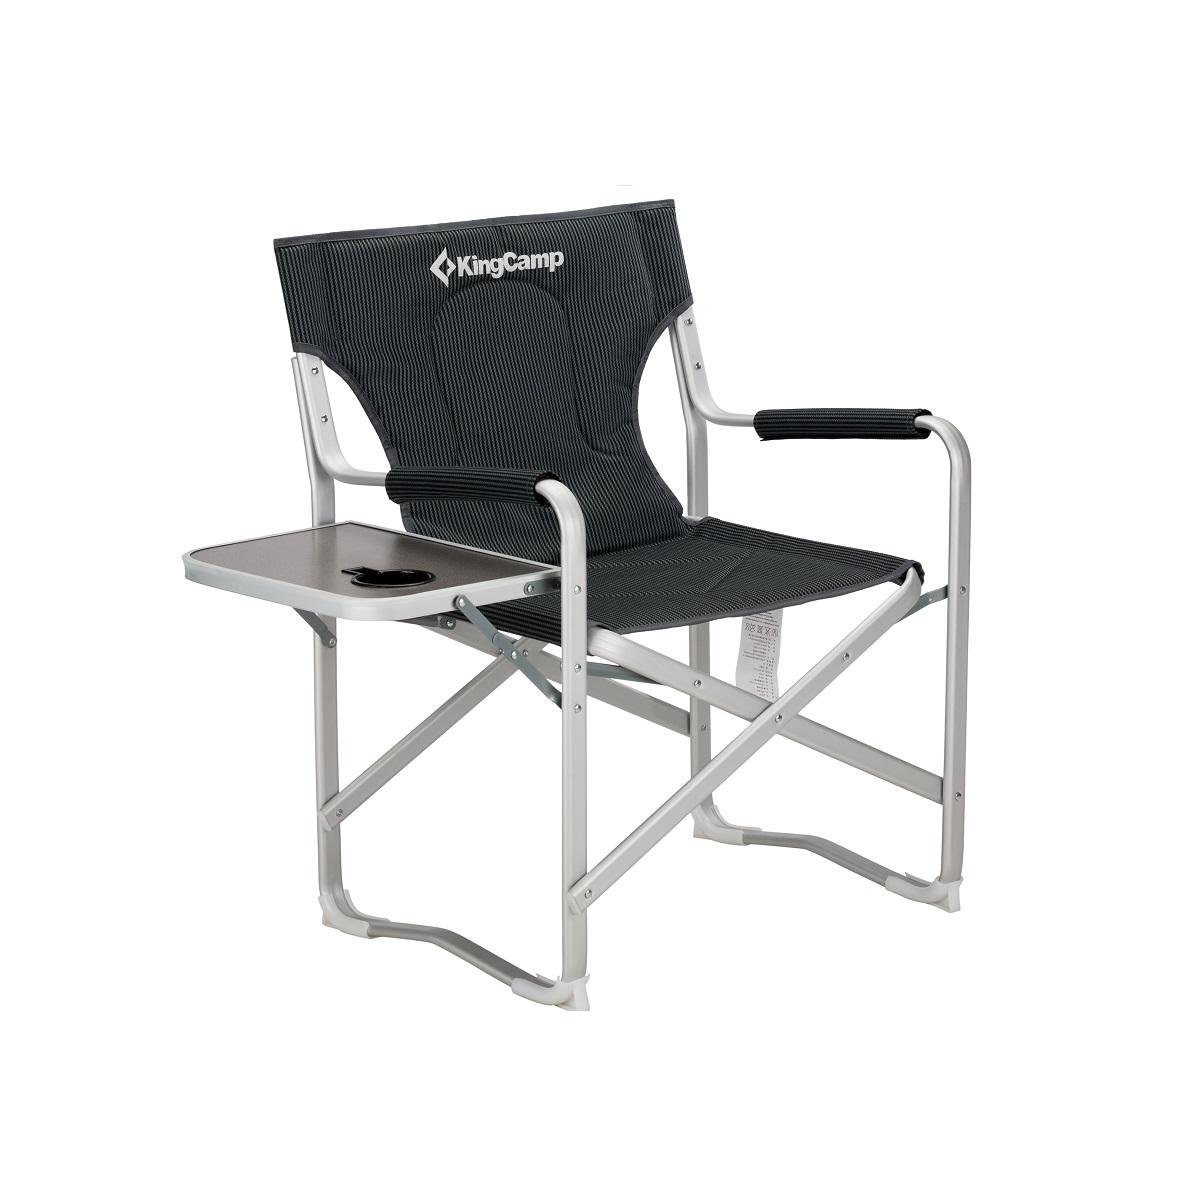 Campingová skladacia stolička KING CAMP Deluxe Director